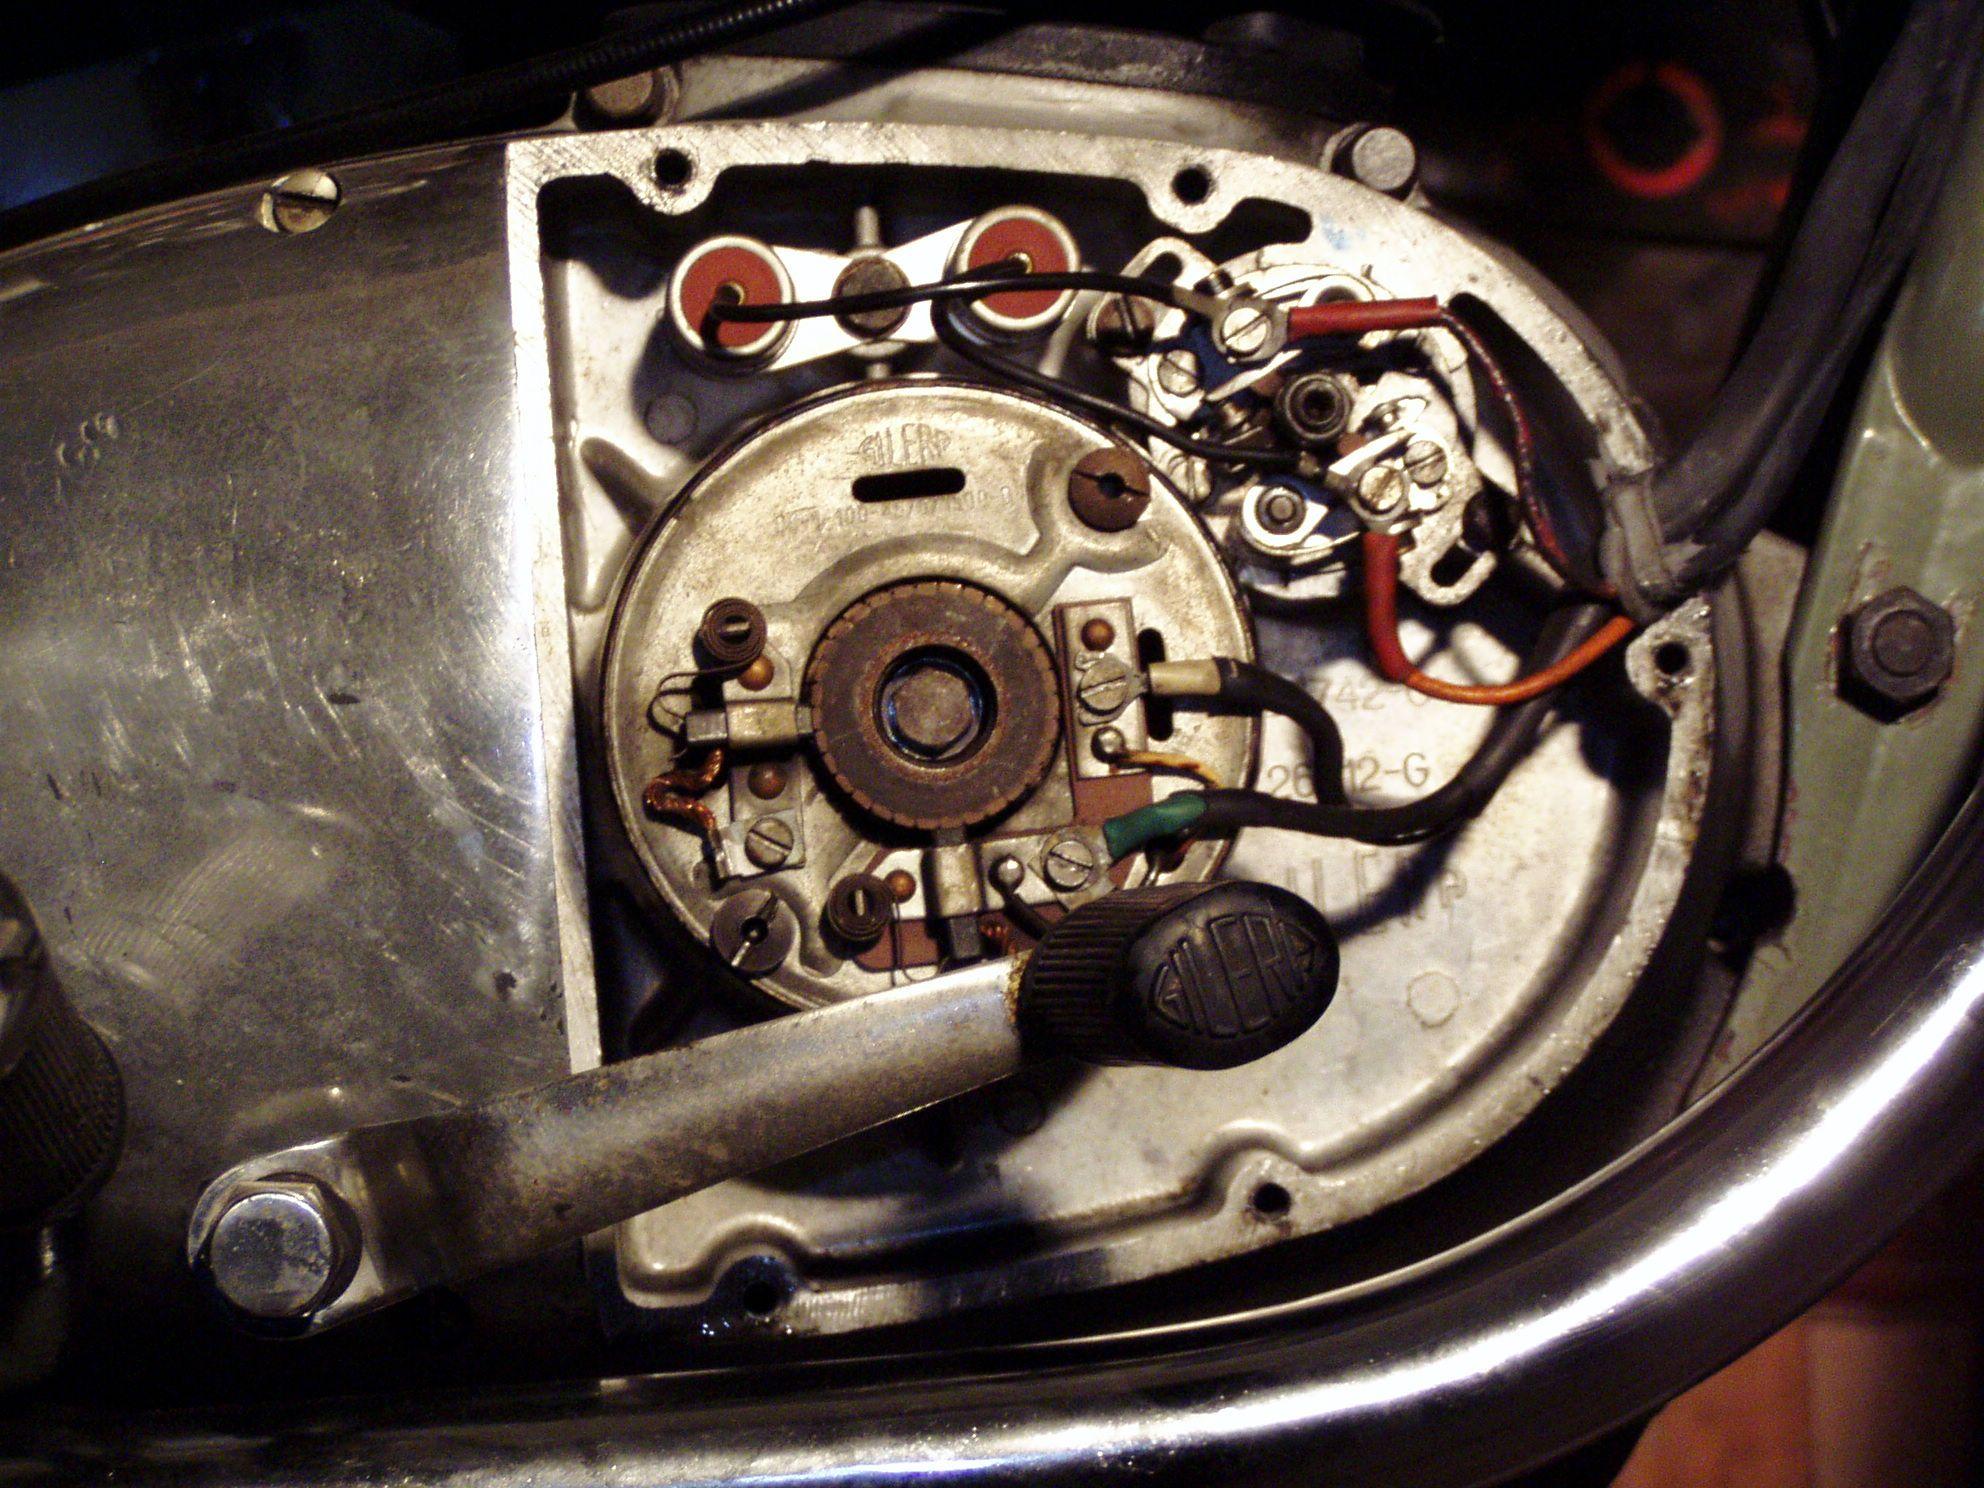 electronic ignition wiring diagram powerdynamo for gilera twin b300  powerdynamo for gilera twin b300